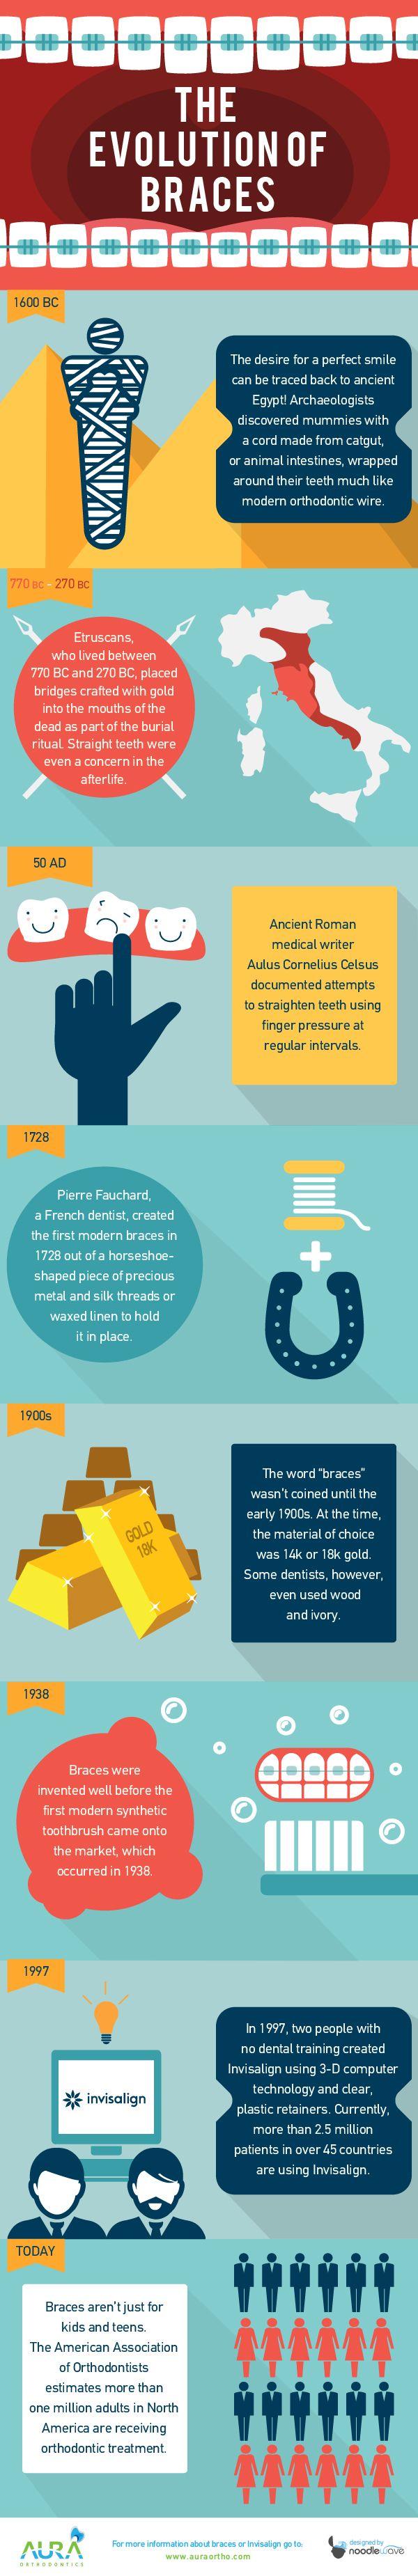 The Evolution of Braces - Infographic   Aura Orthodontics Surrey http://www.auraortho.com #braces #orthodontist #orthodontics